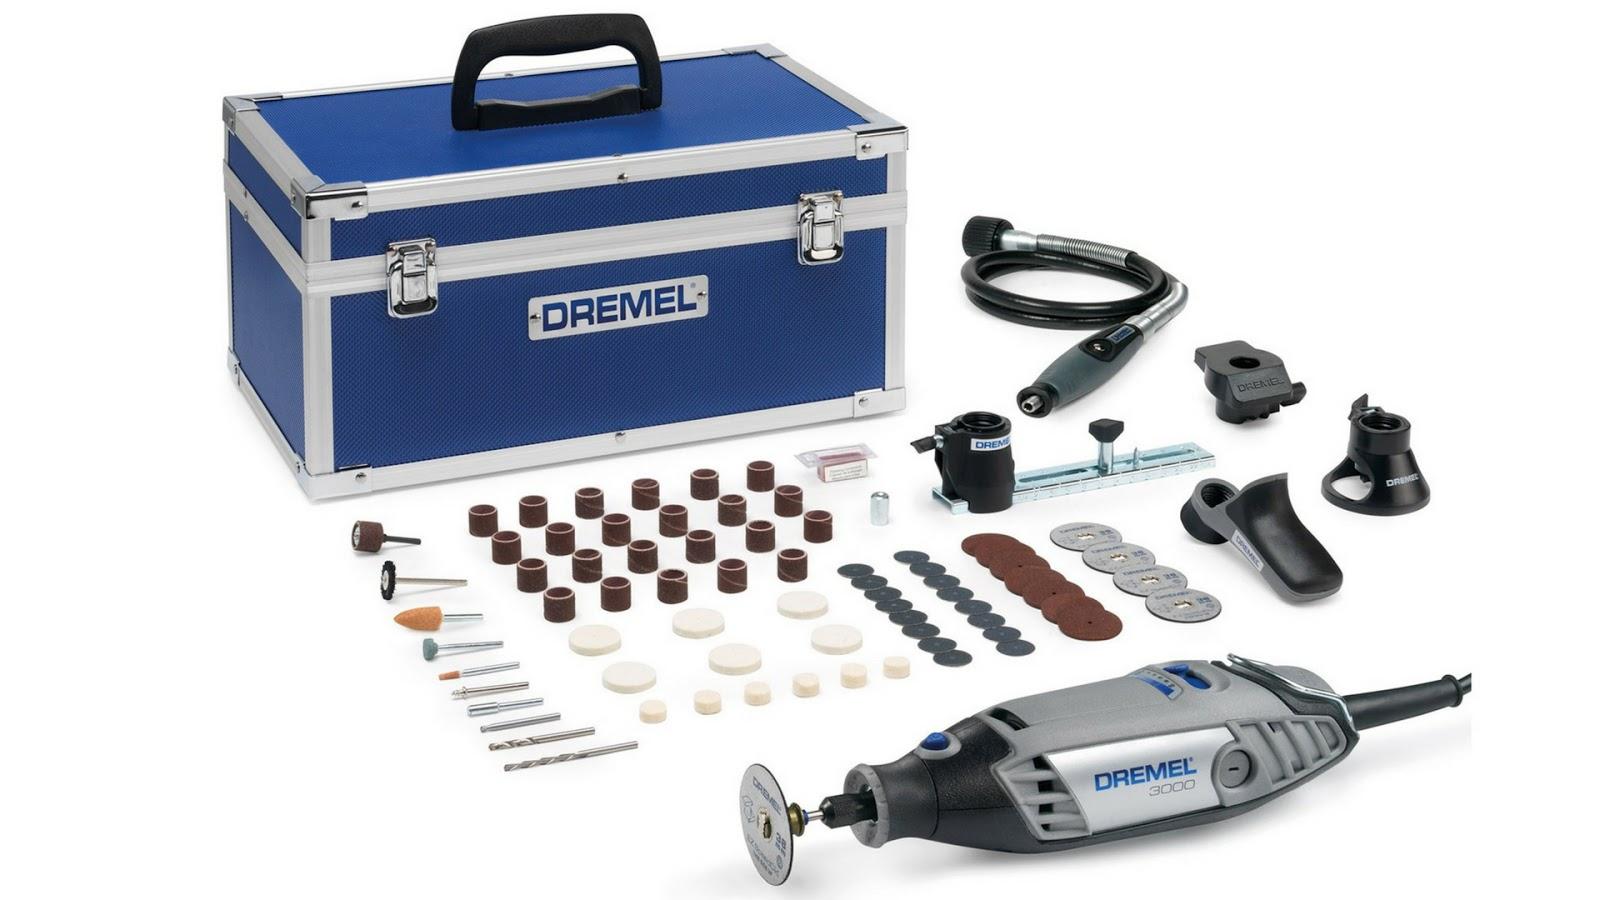 DREMEL® 3000 (3000-5/75) accesorios